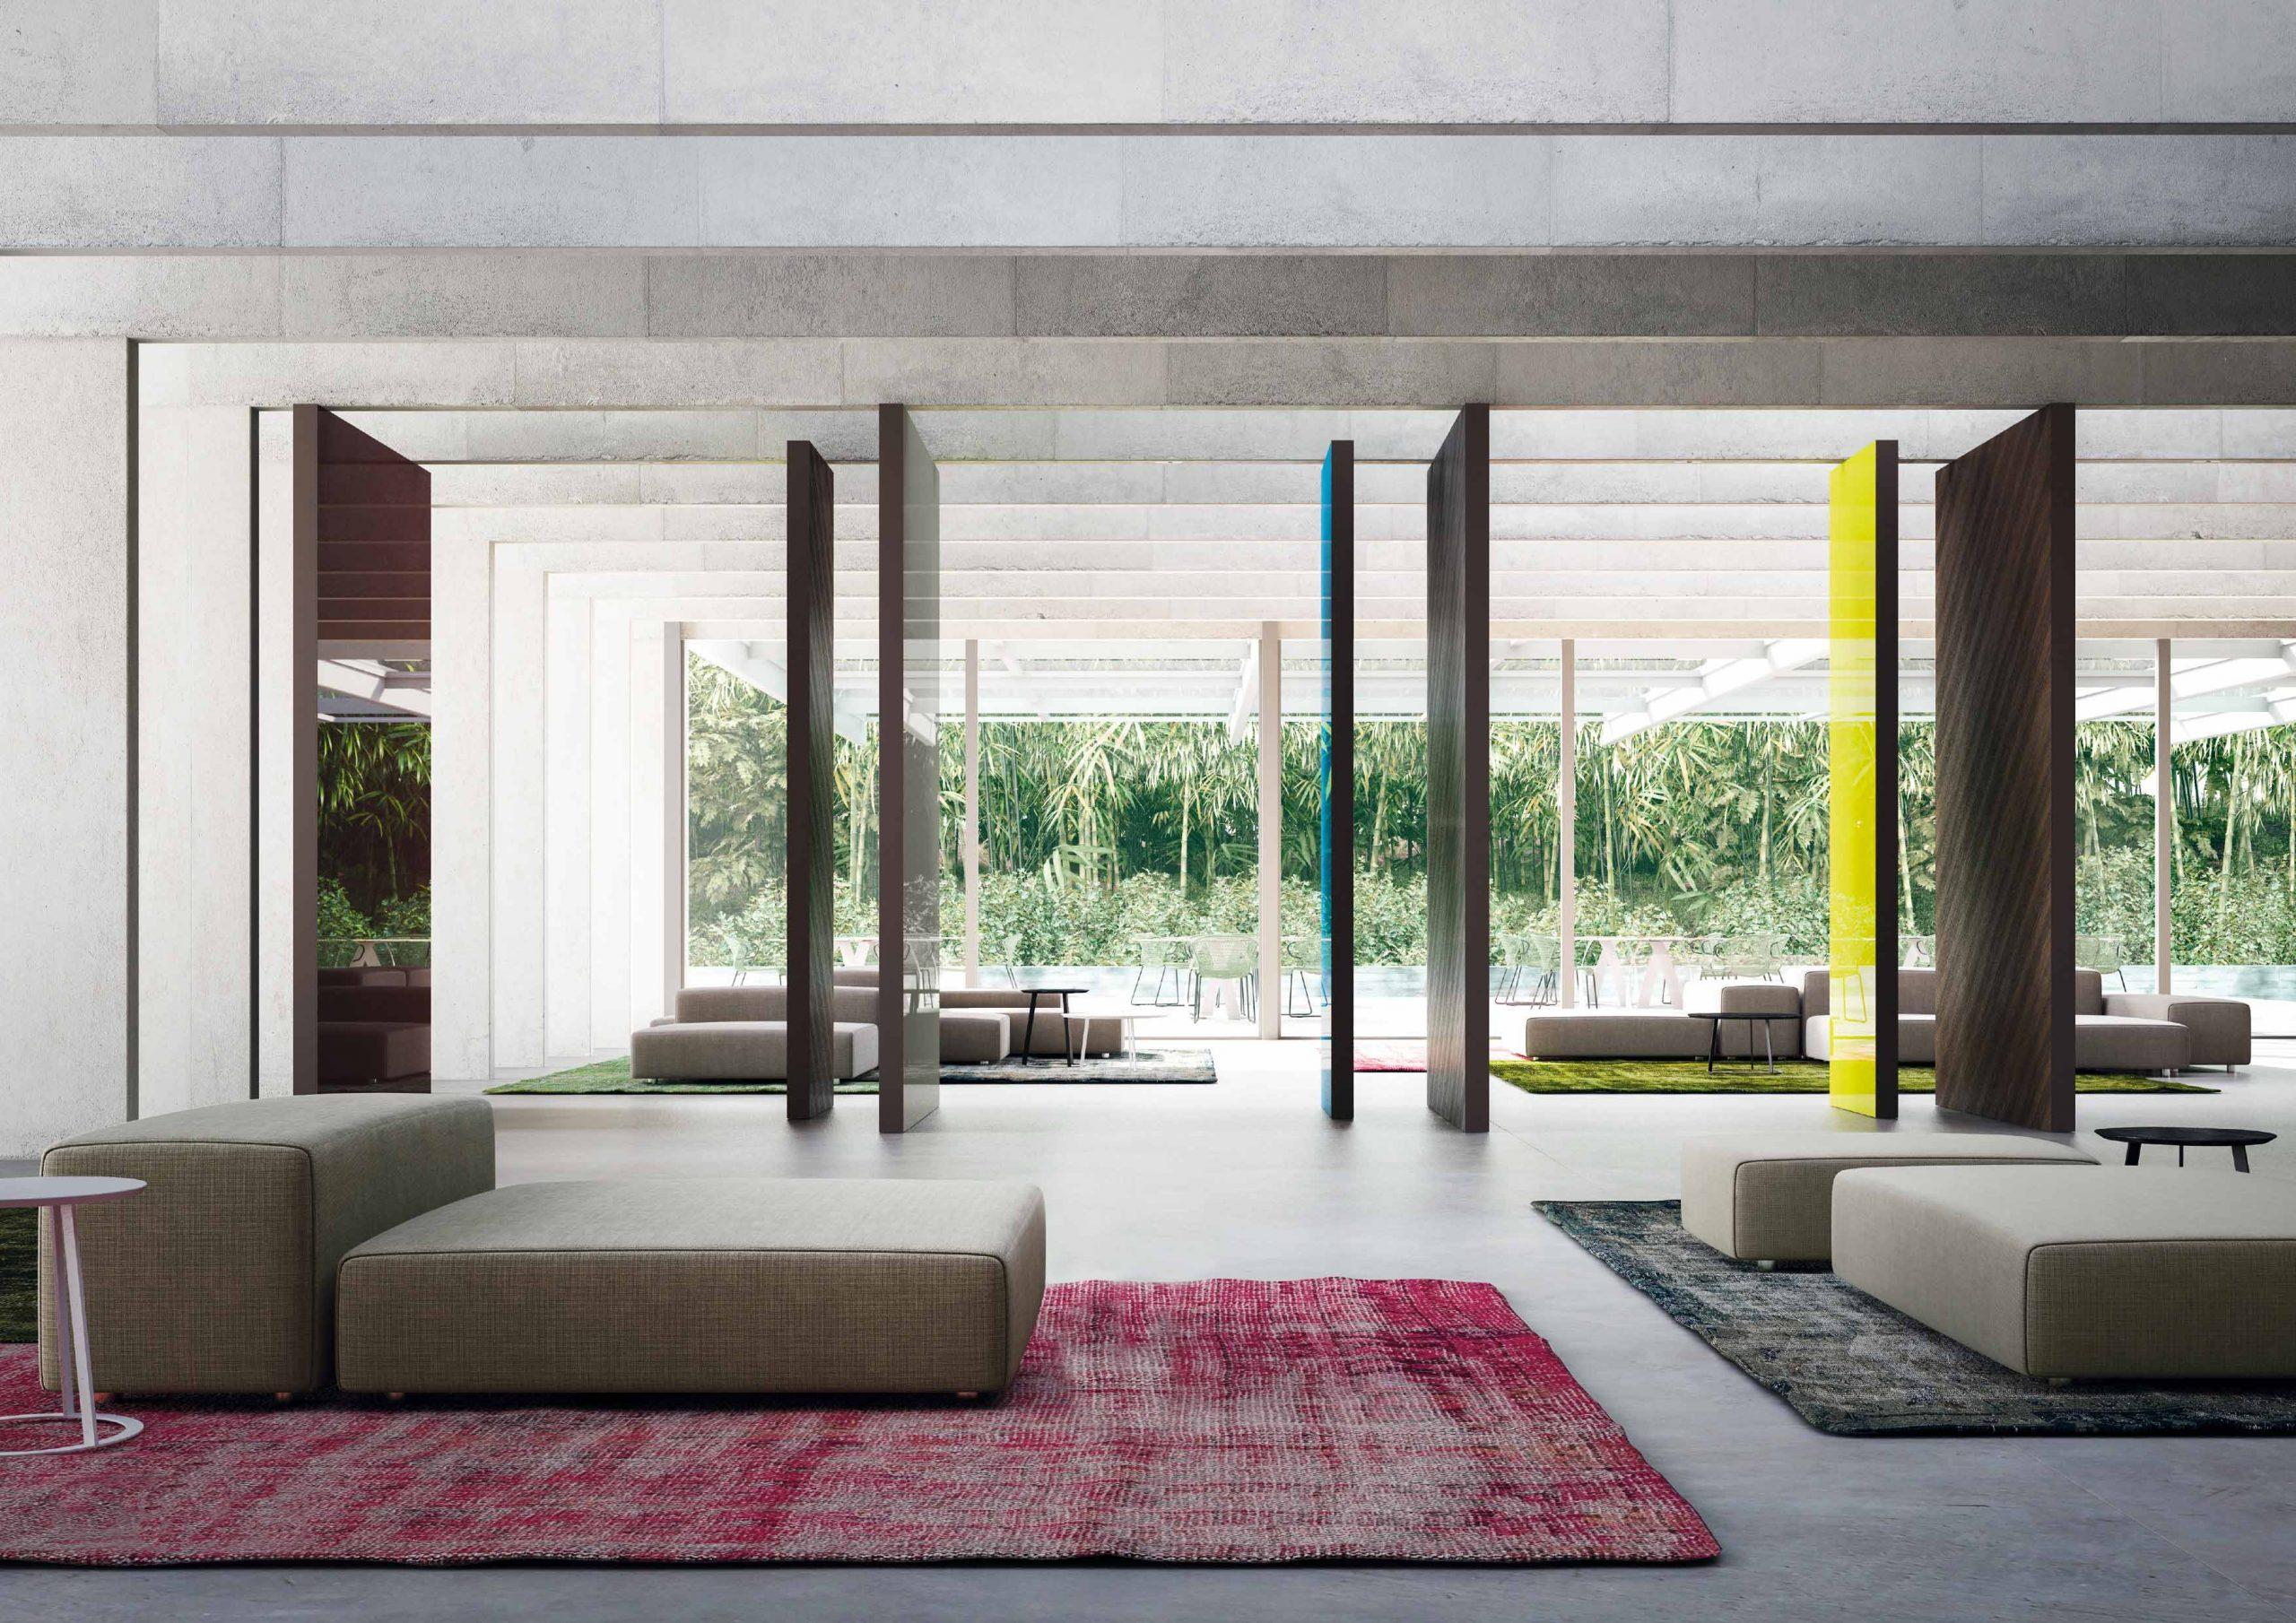 colorful-pivoting-wall-in-resort-1-fritsjurgens-pivot-hinges-inside-scaled.jpg